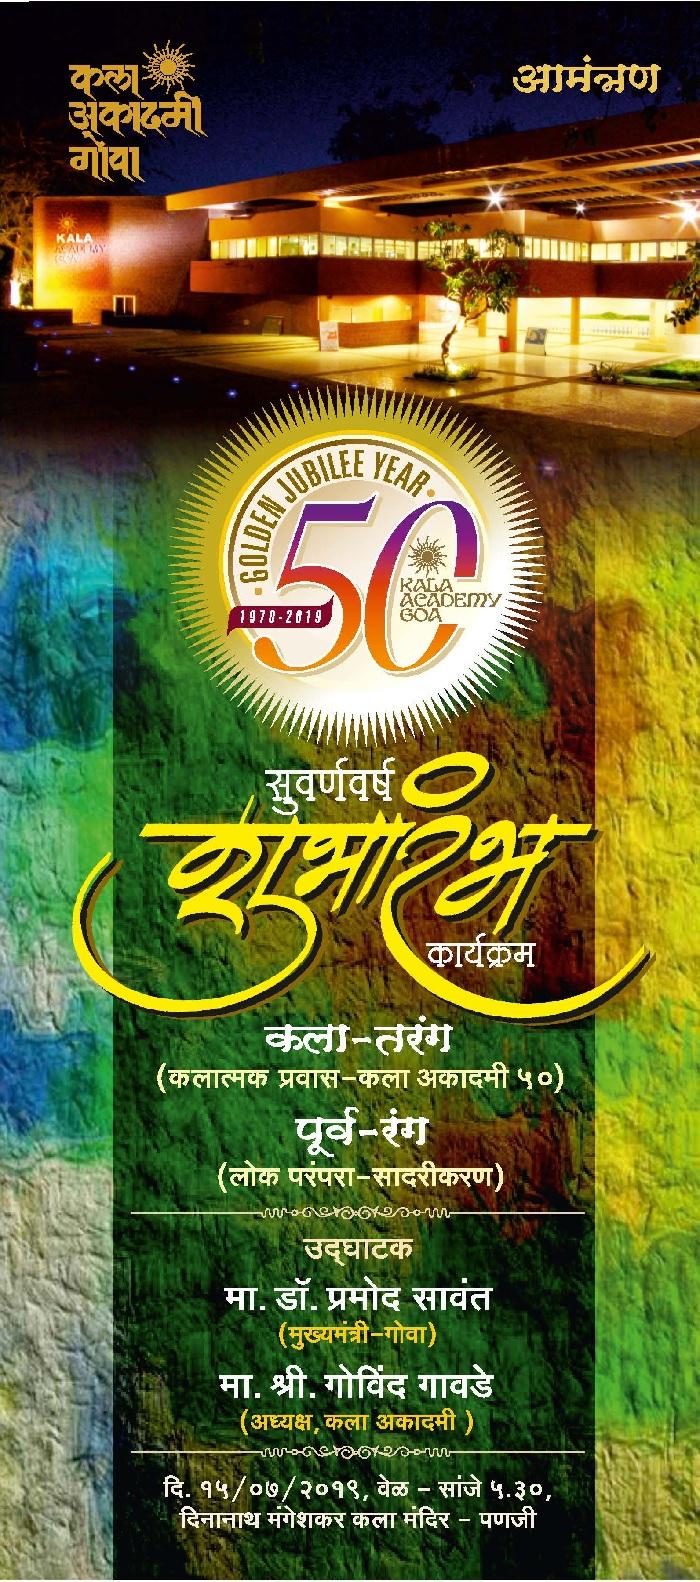 Invitation of Golden Jubilee Celebration-1